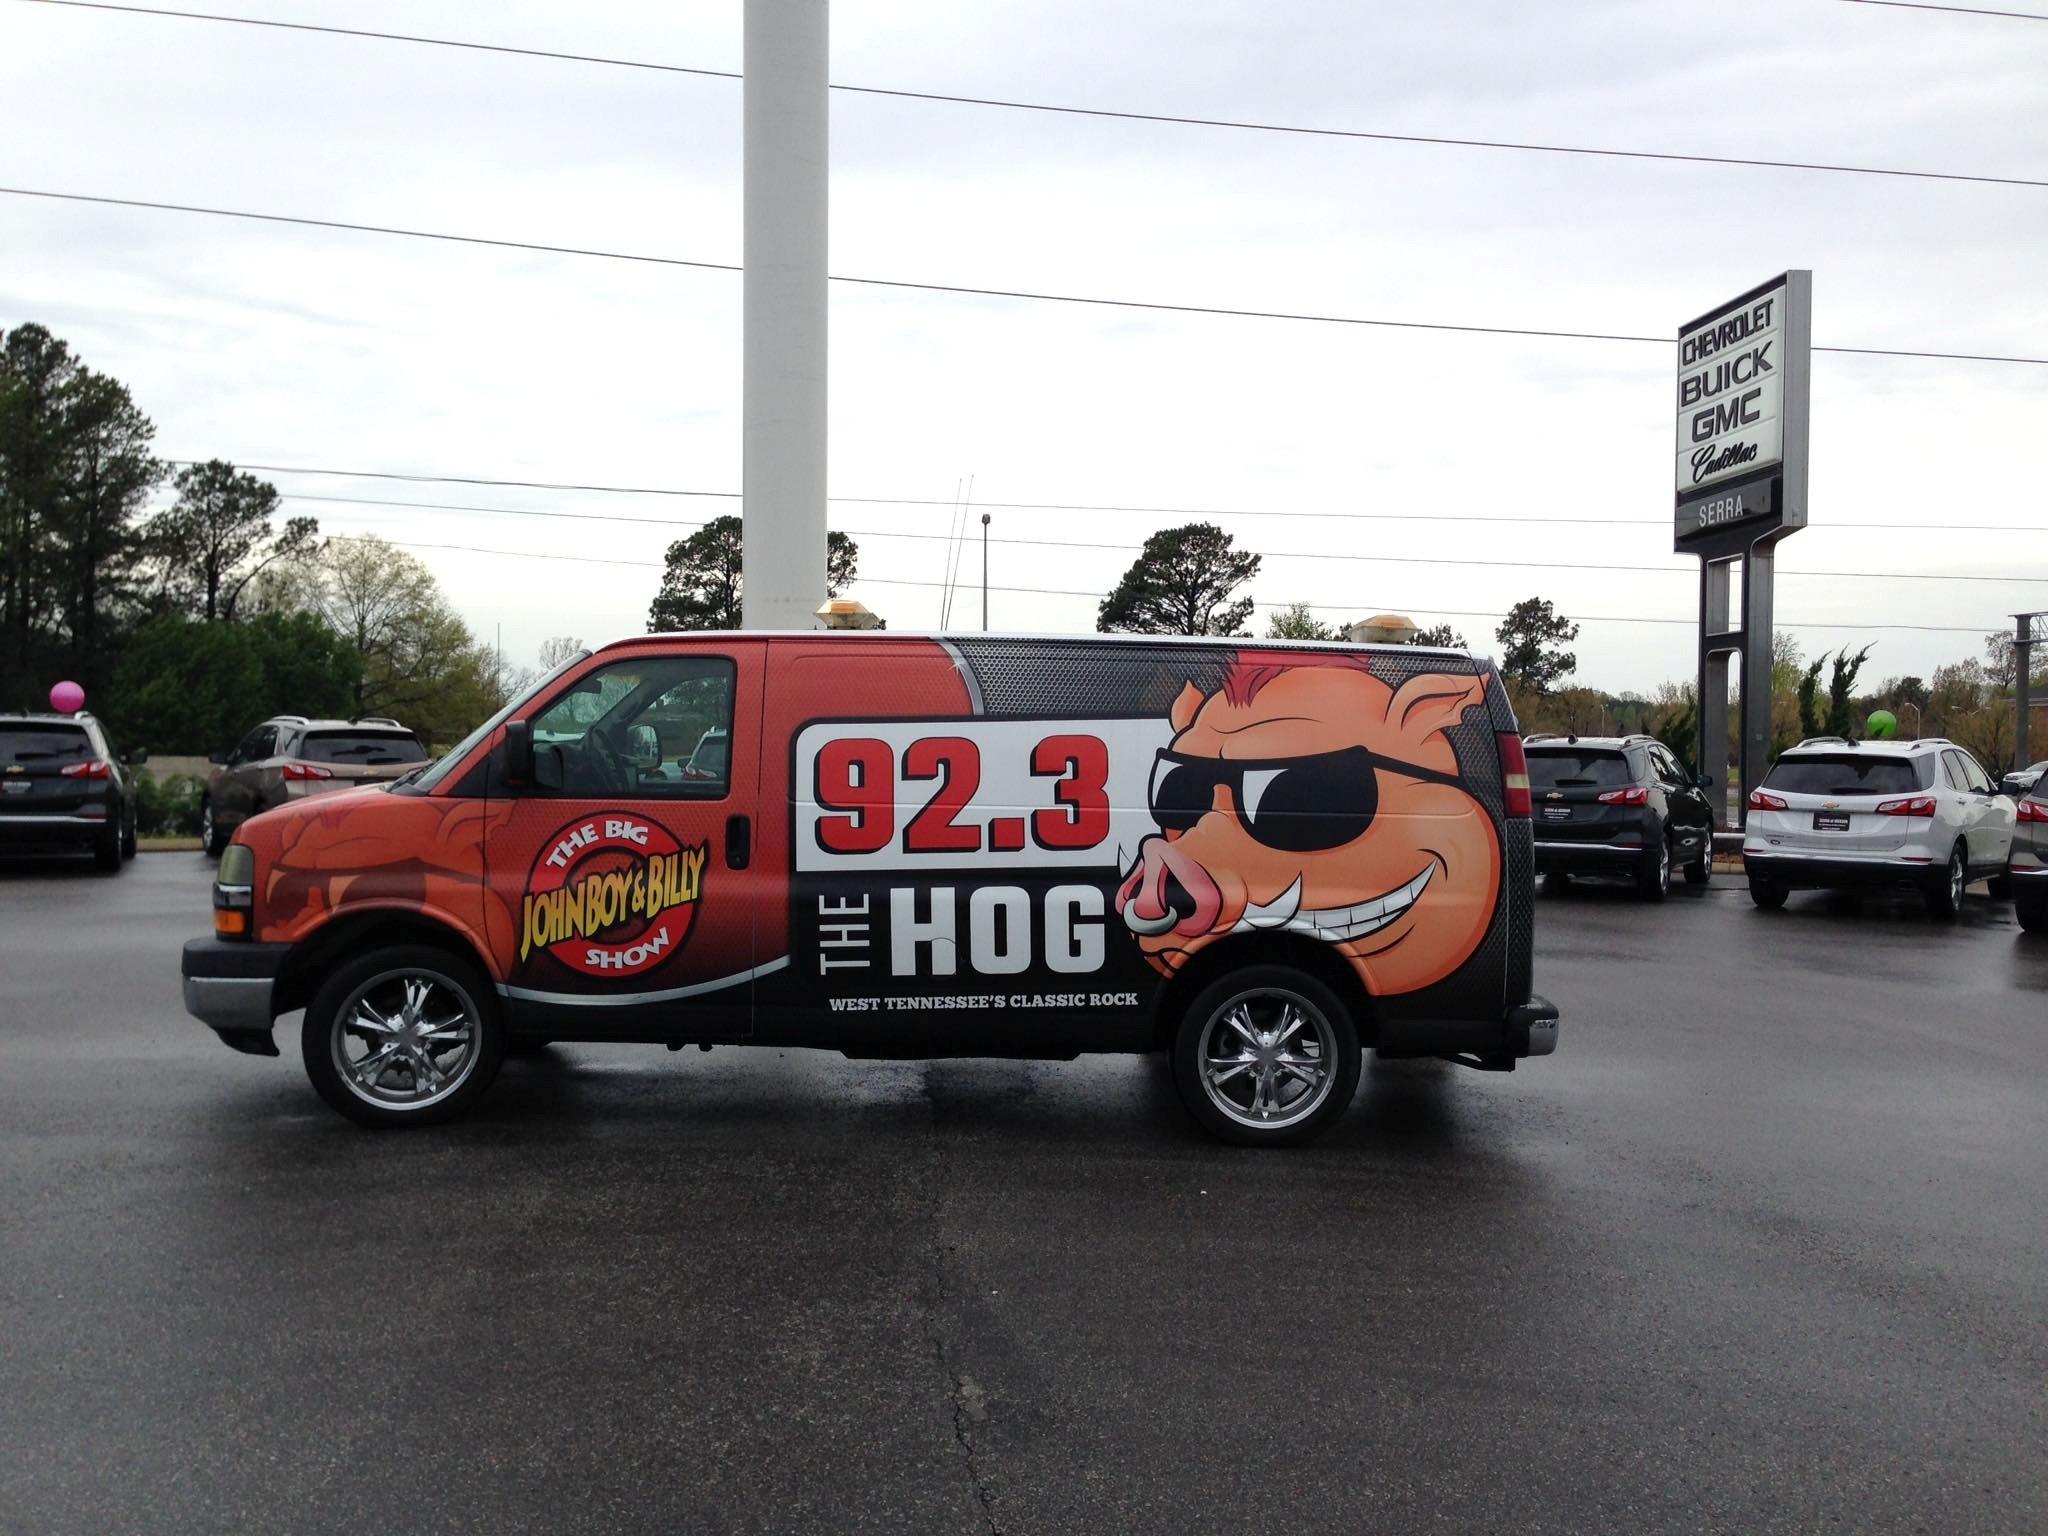 Live Action Broadcast At Serra Of Jackson 92 3 The Hog